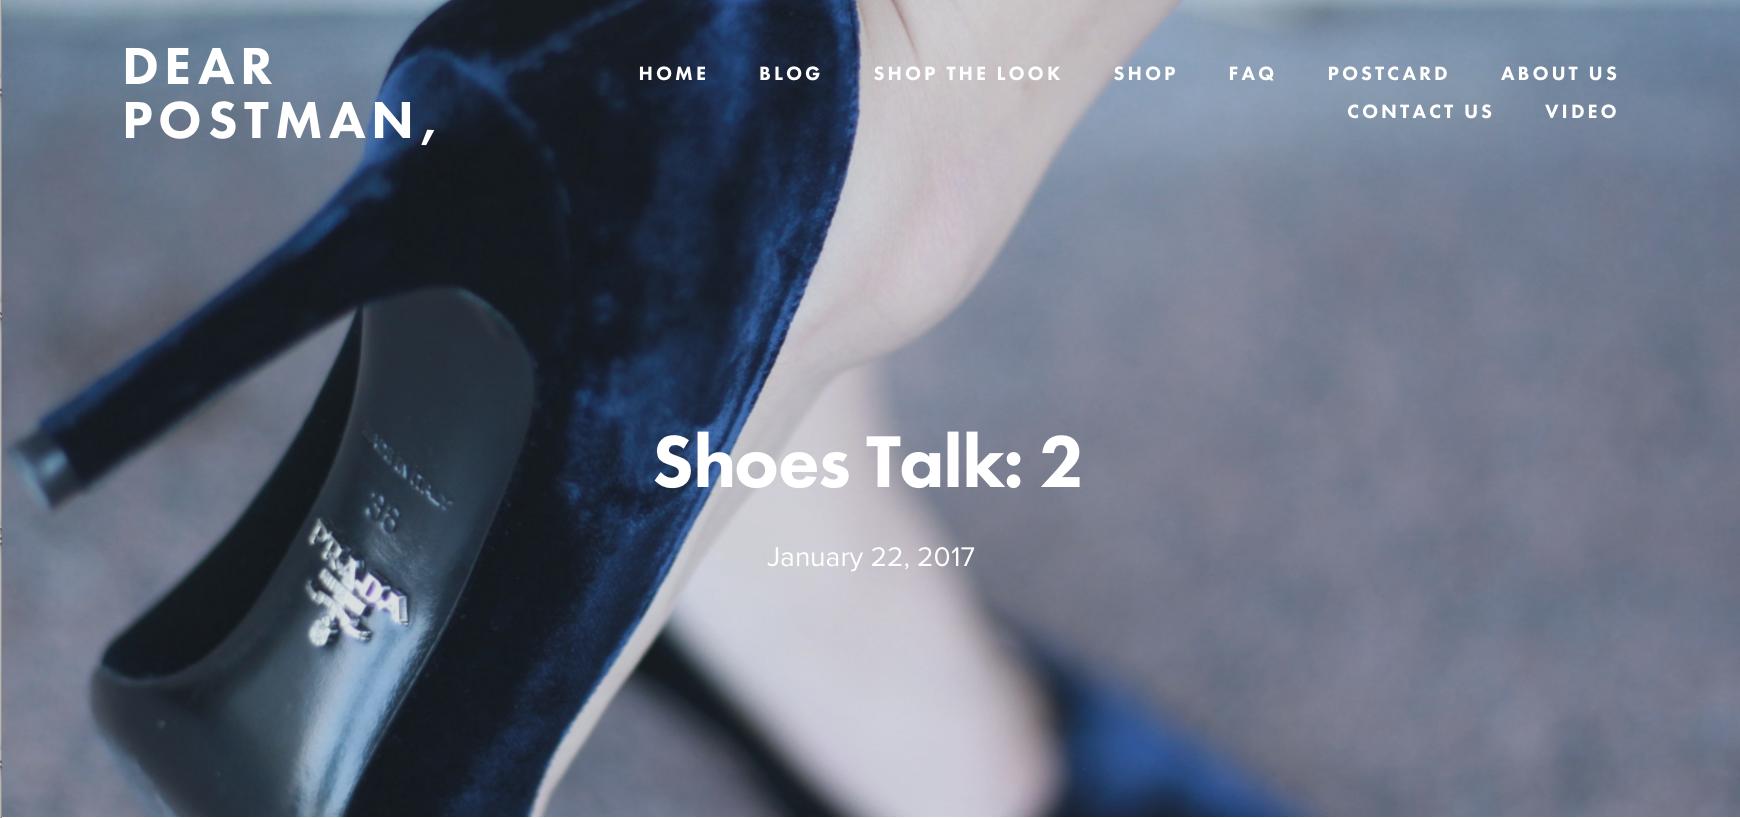 Shoes Talk: 2